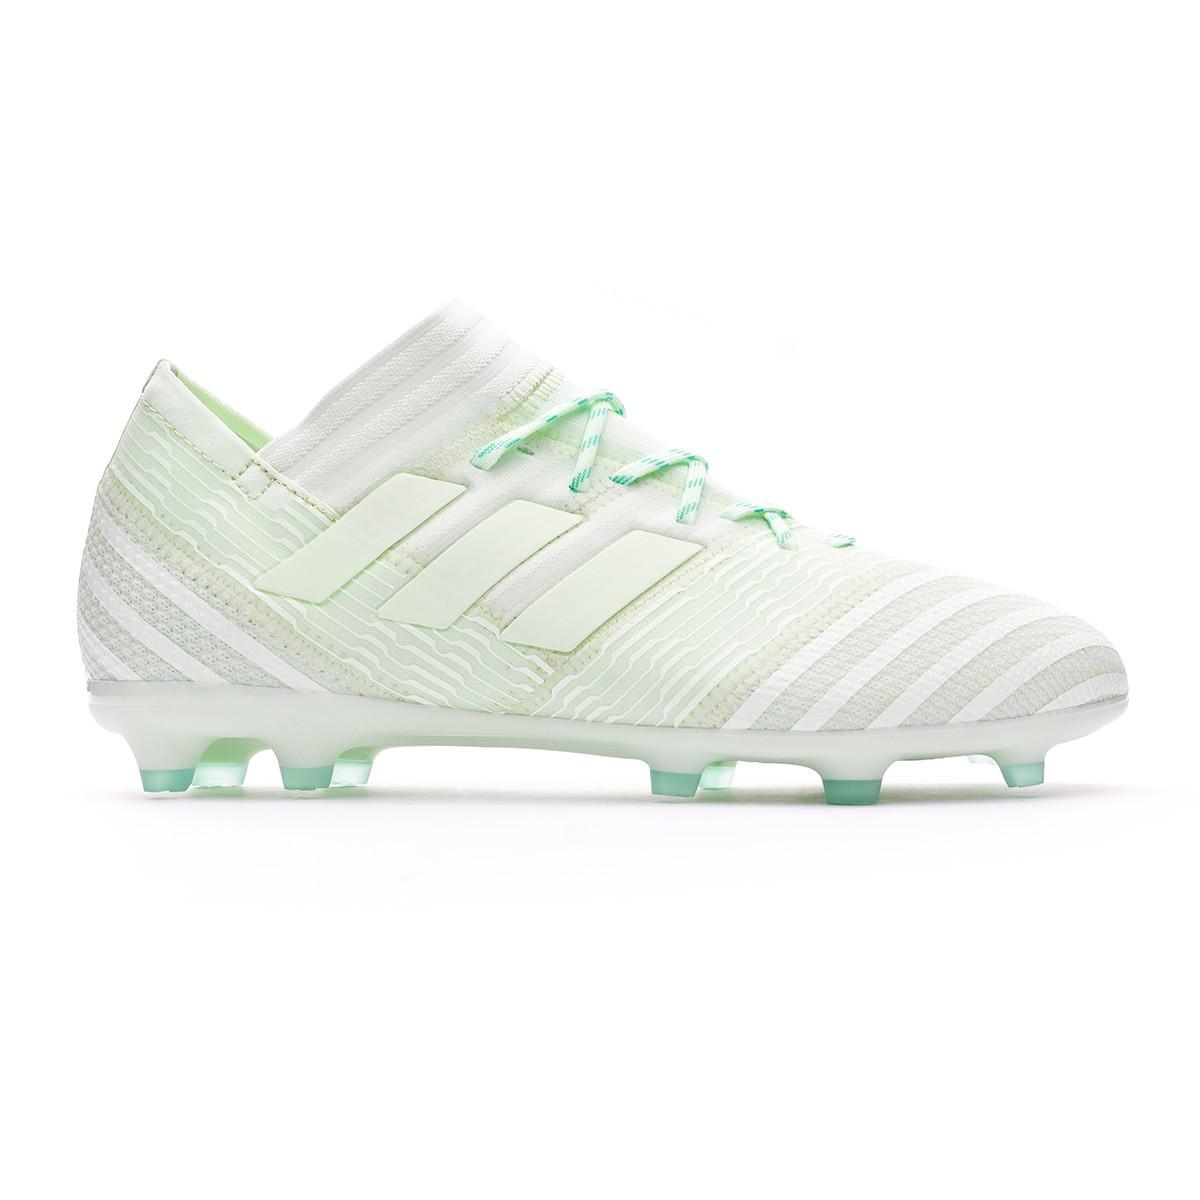 b549037b39c1 Football Boots adidas Kids Nemeziz 17.1 FG Aero green-Hi-res green -  Football store Fútbol Emotion